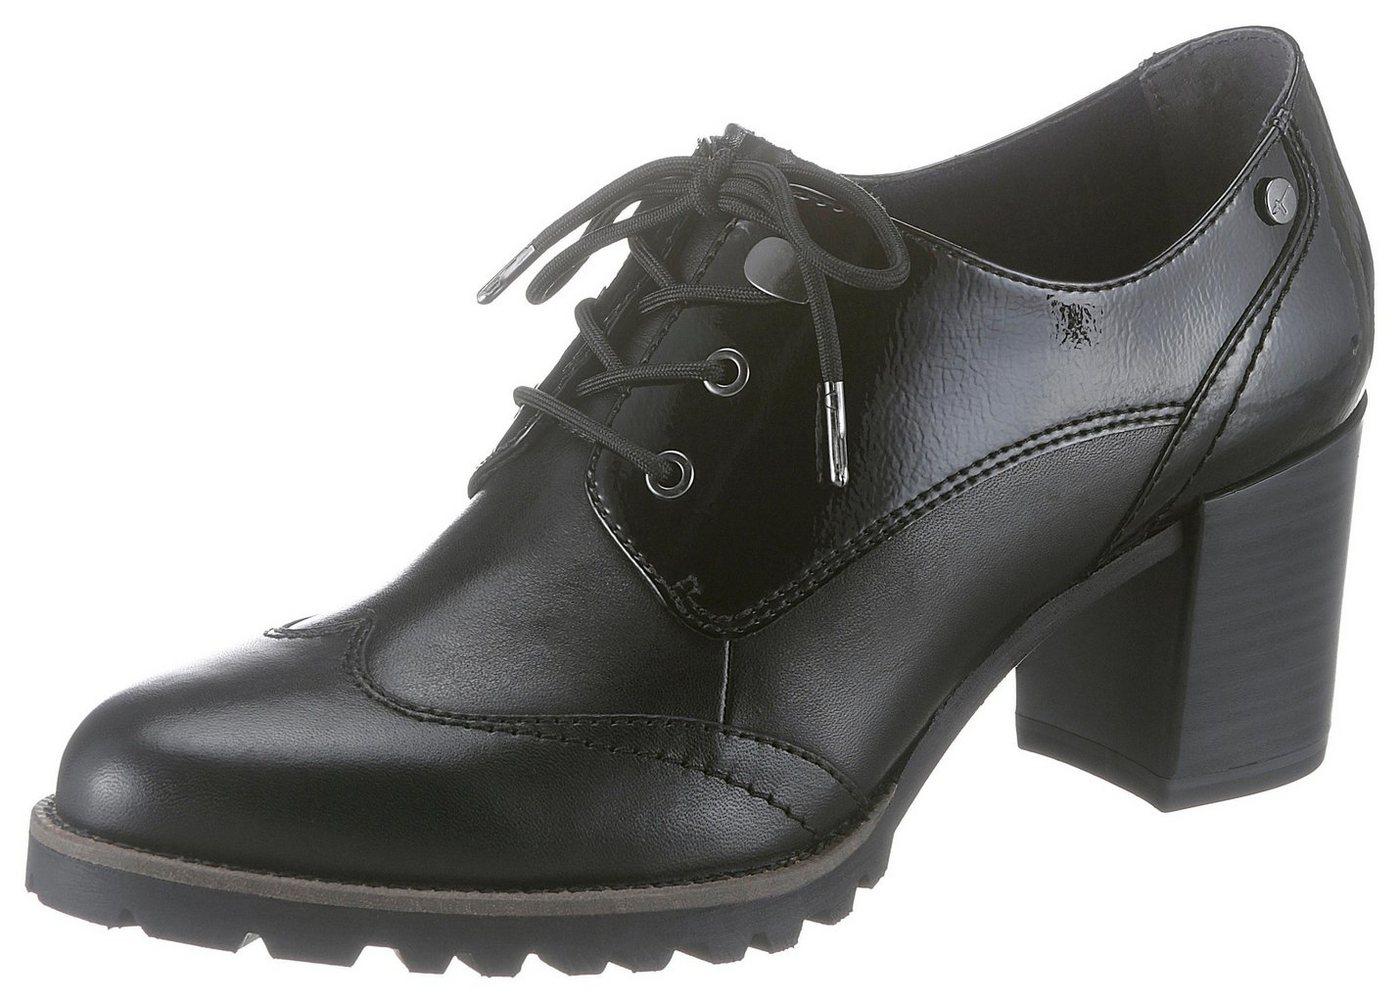 Tamaris Schnürpumps im eleganten Dandy-Style | Schuhe > Pumps > Schnürpumps | Schwarz | Tamaris